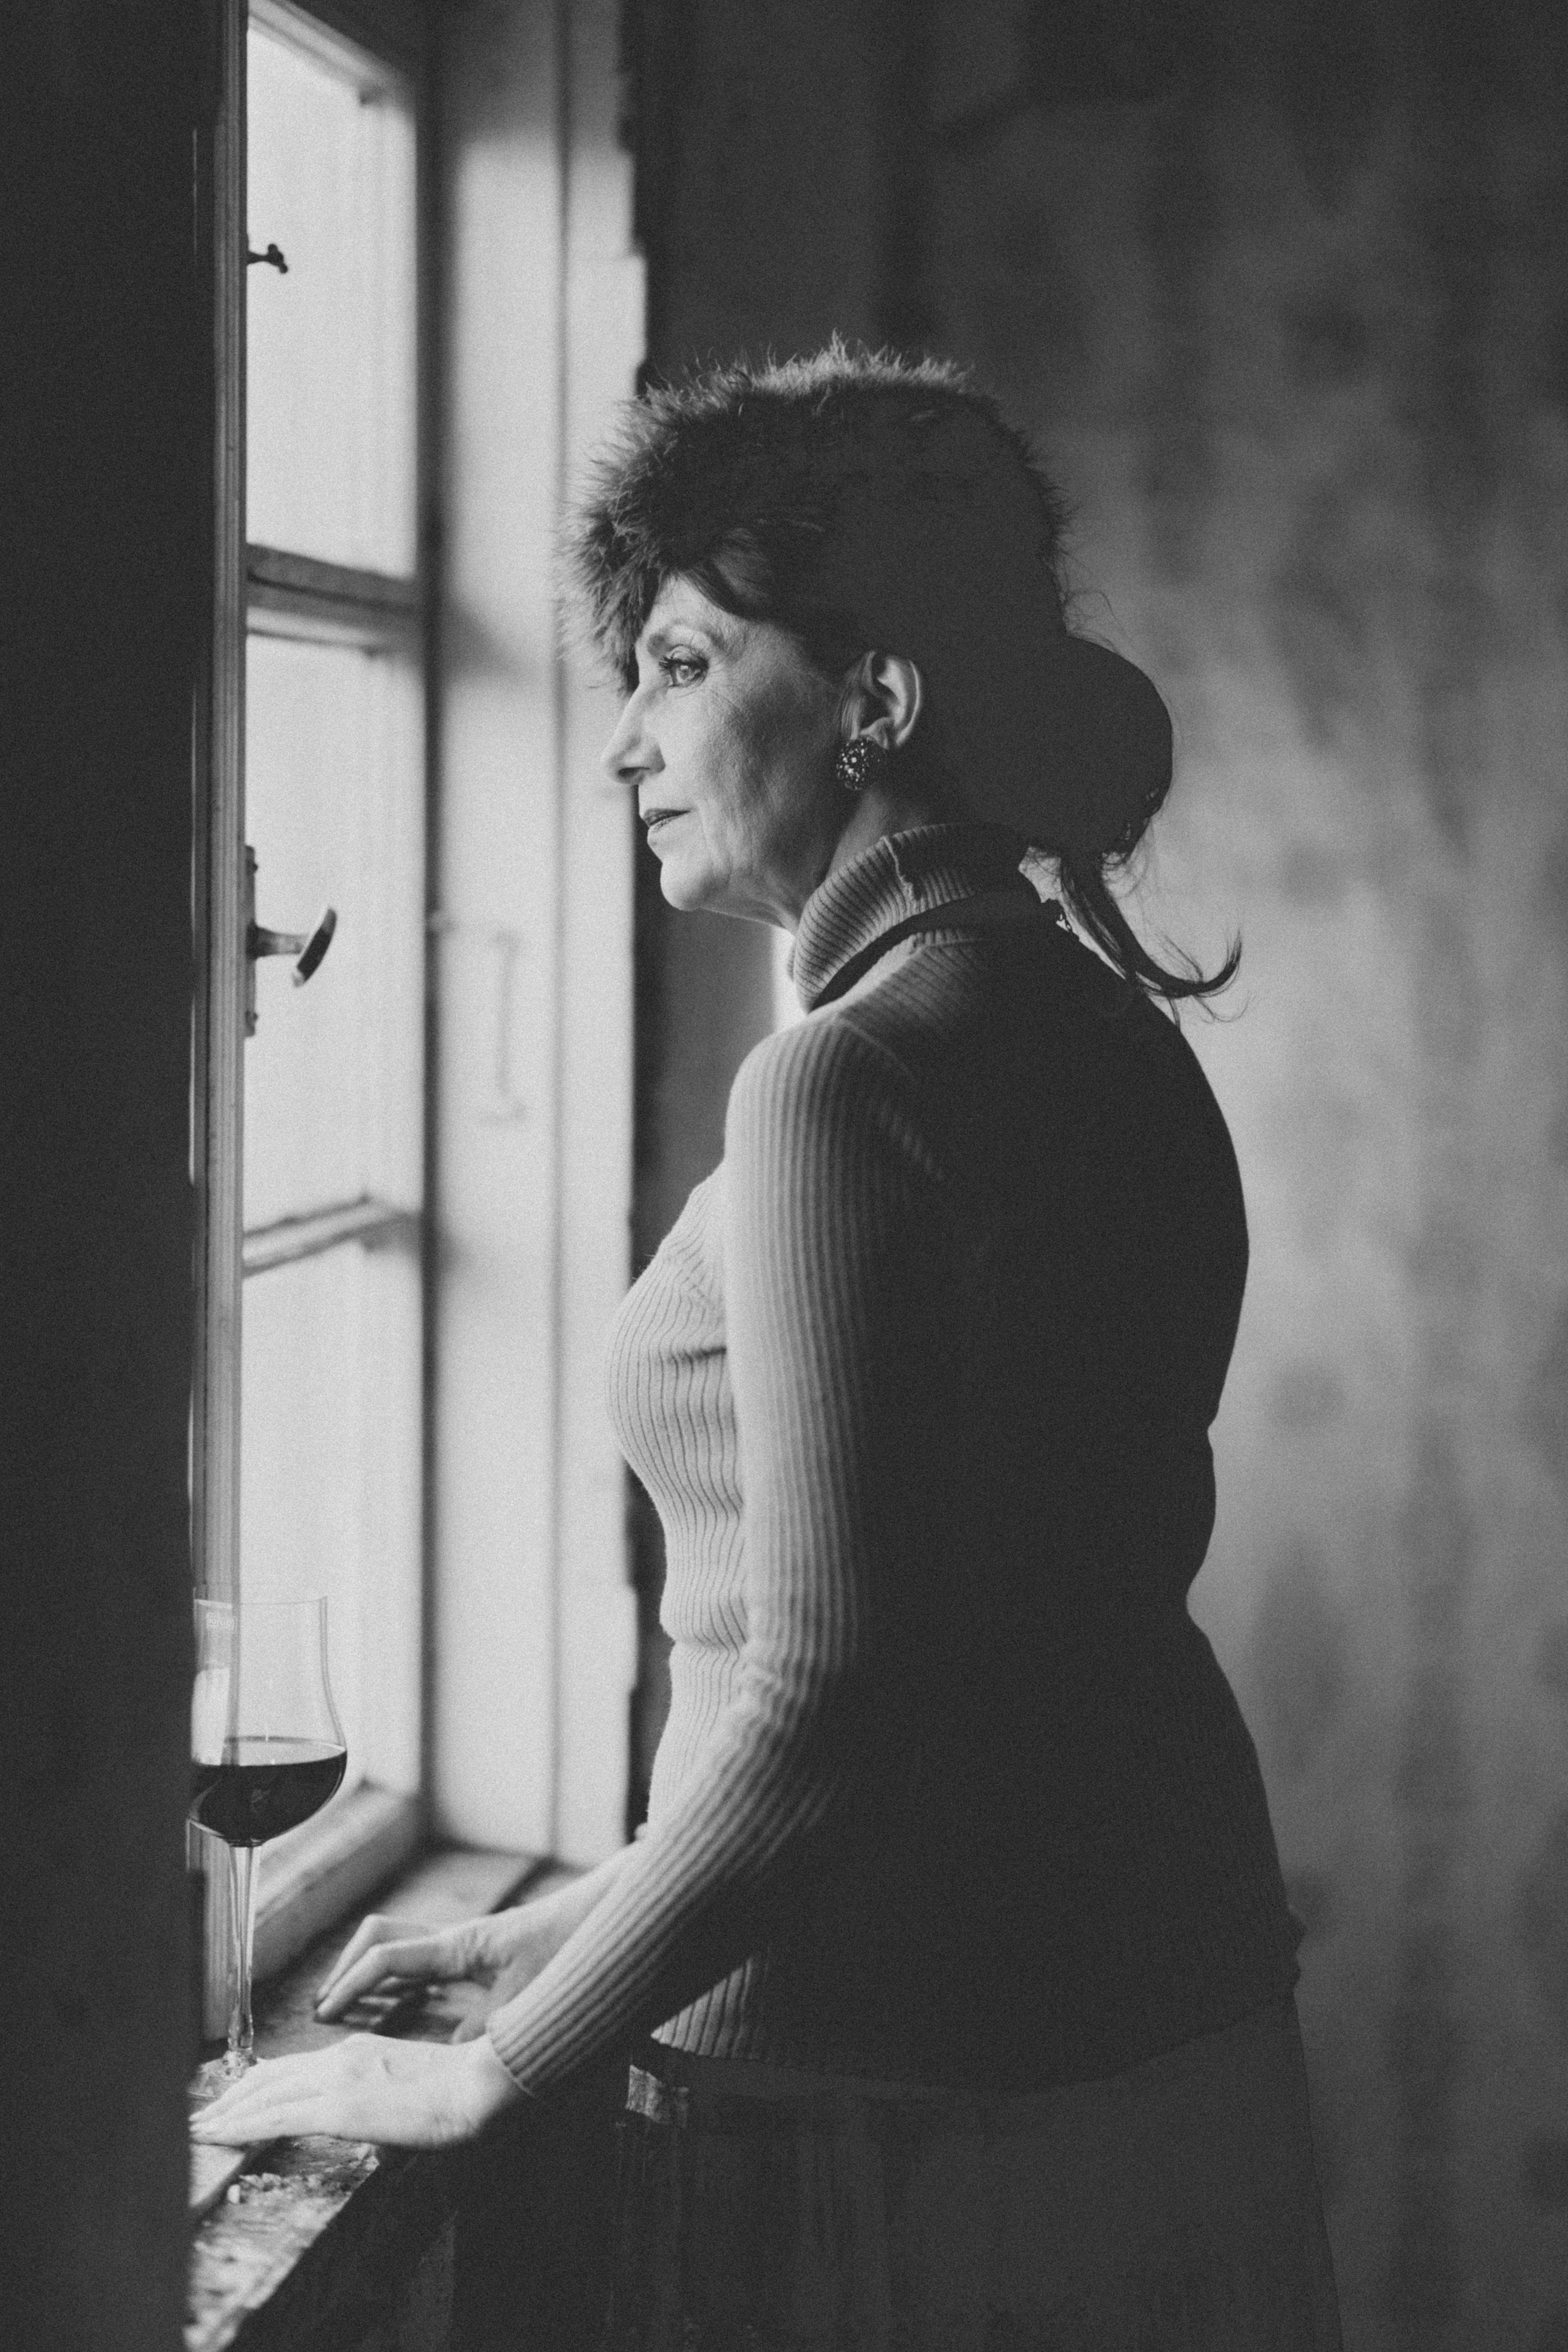 mustvalge portree foto naisest